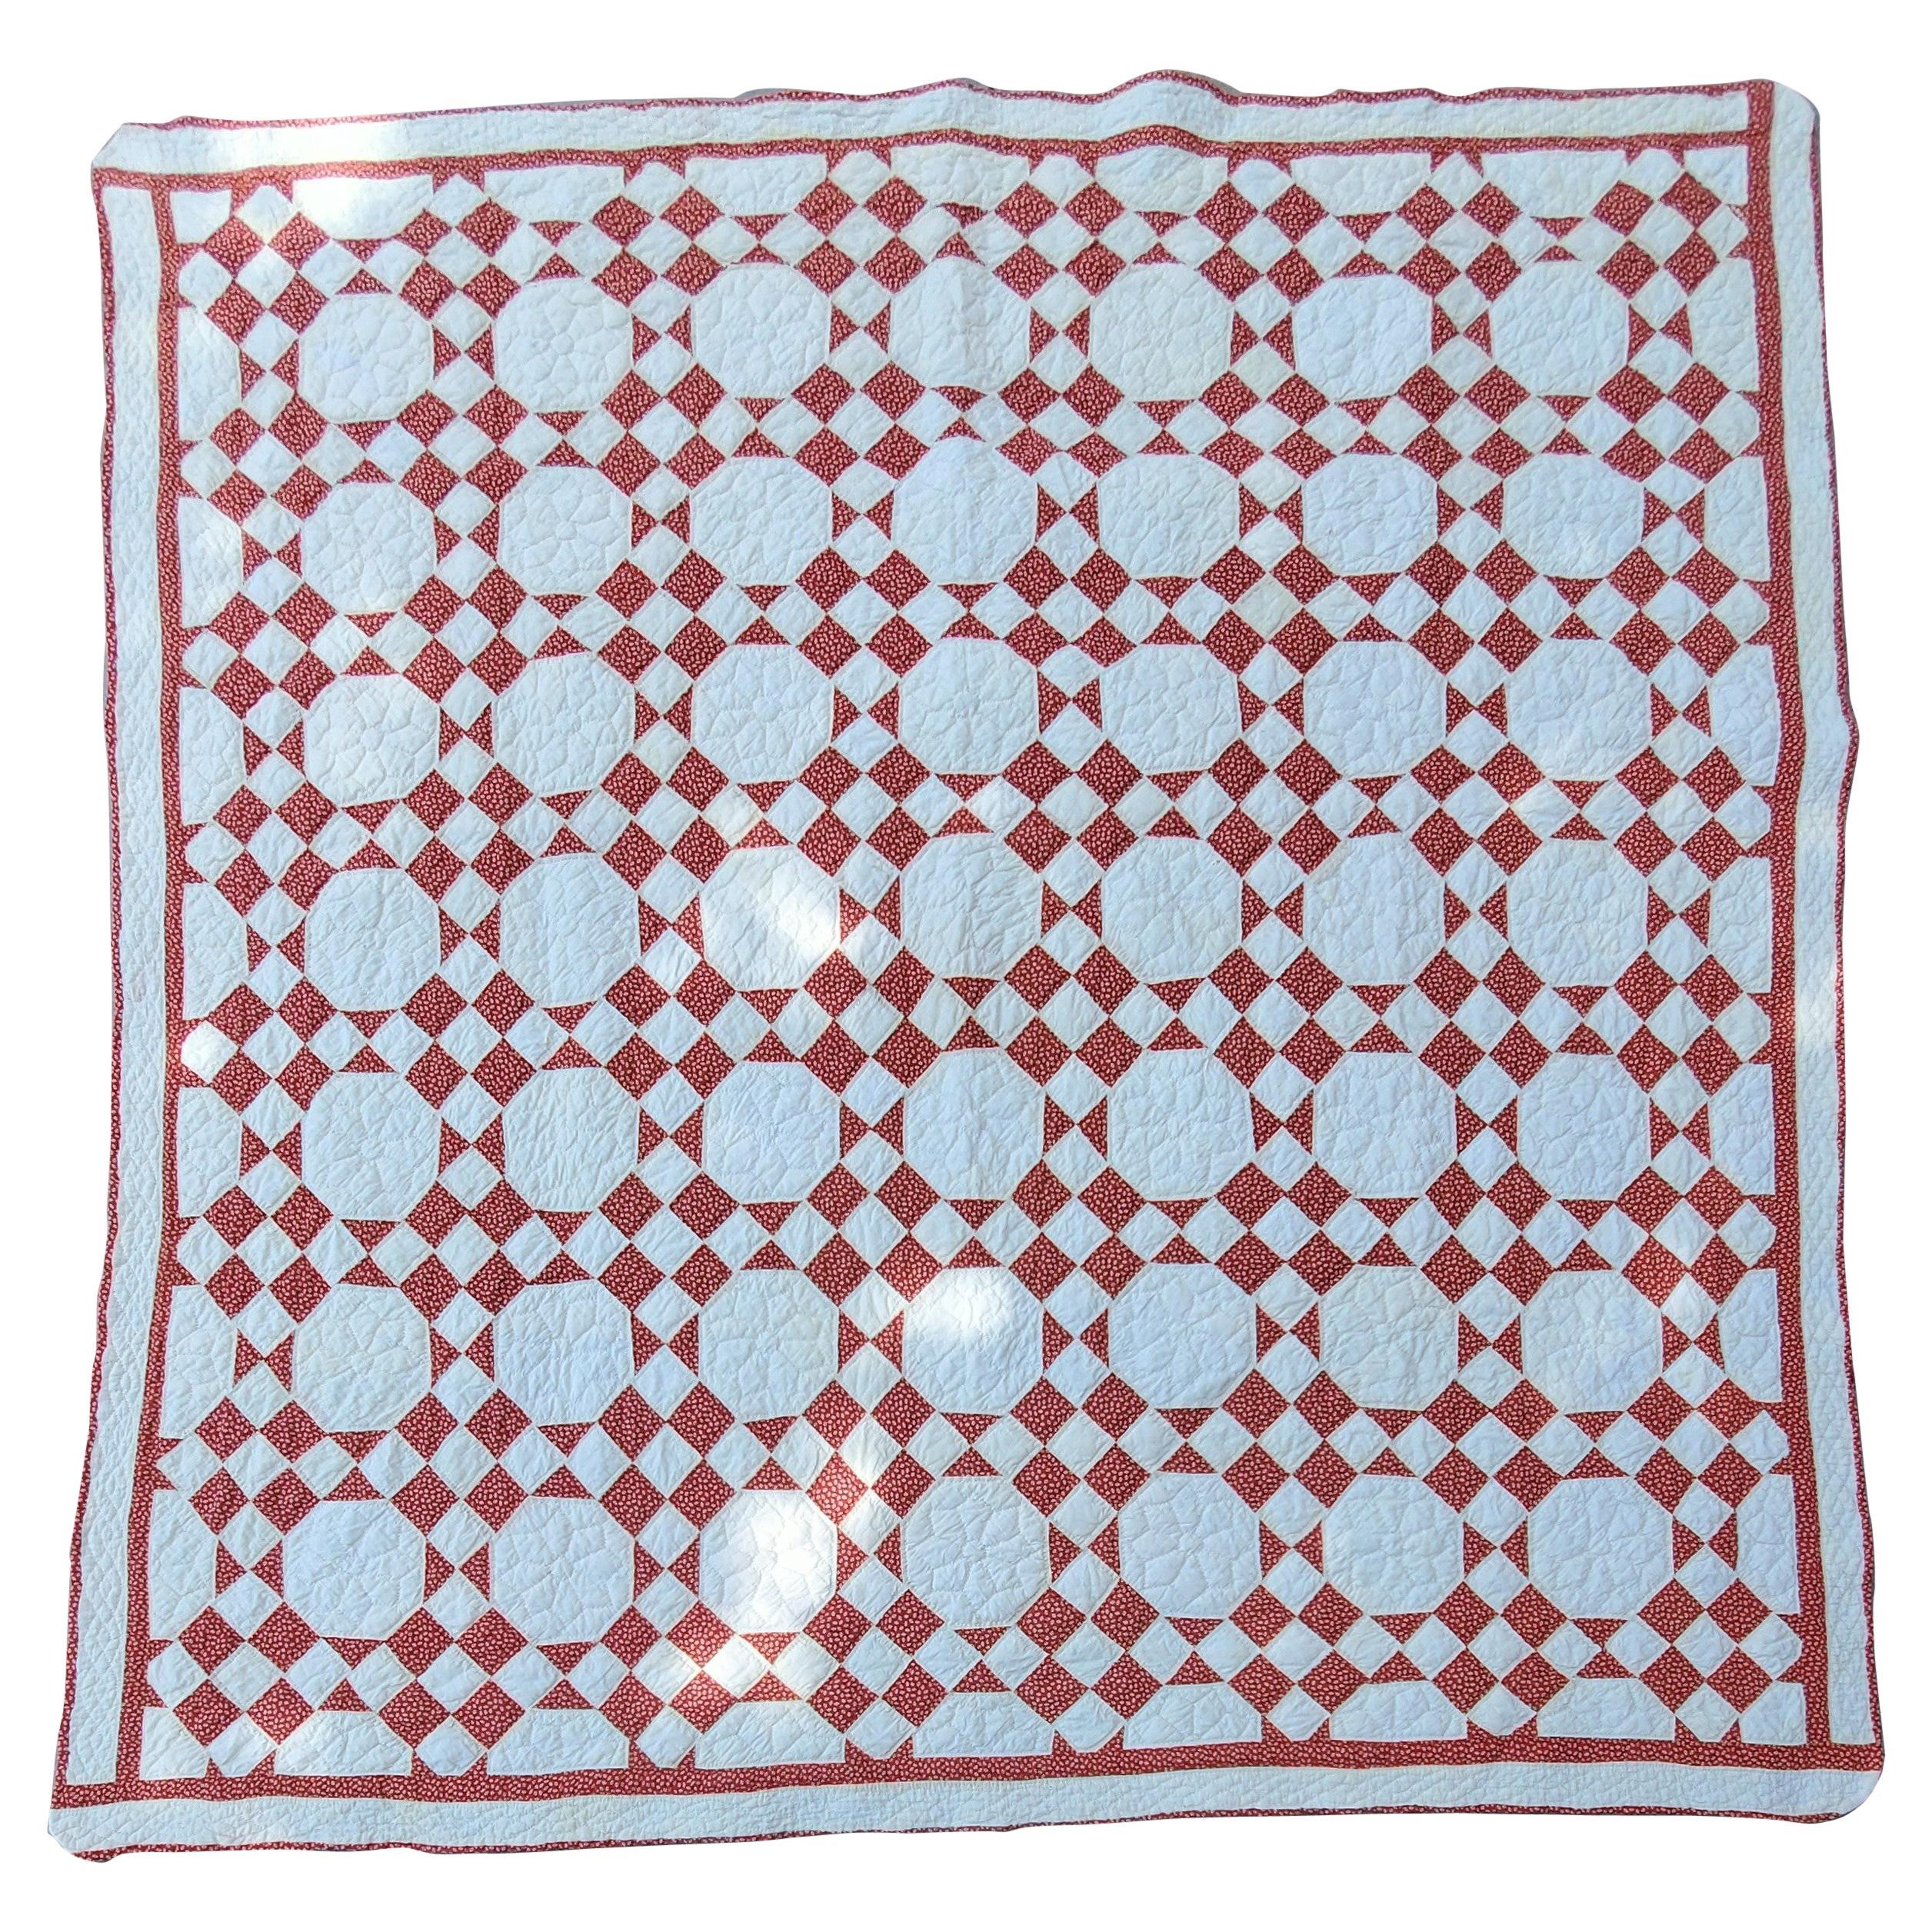 Antique Quilt, 19thc Nine Patch Variation